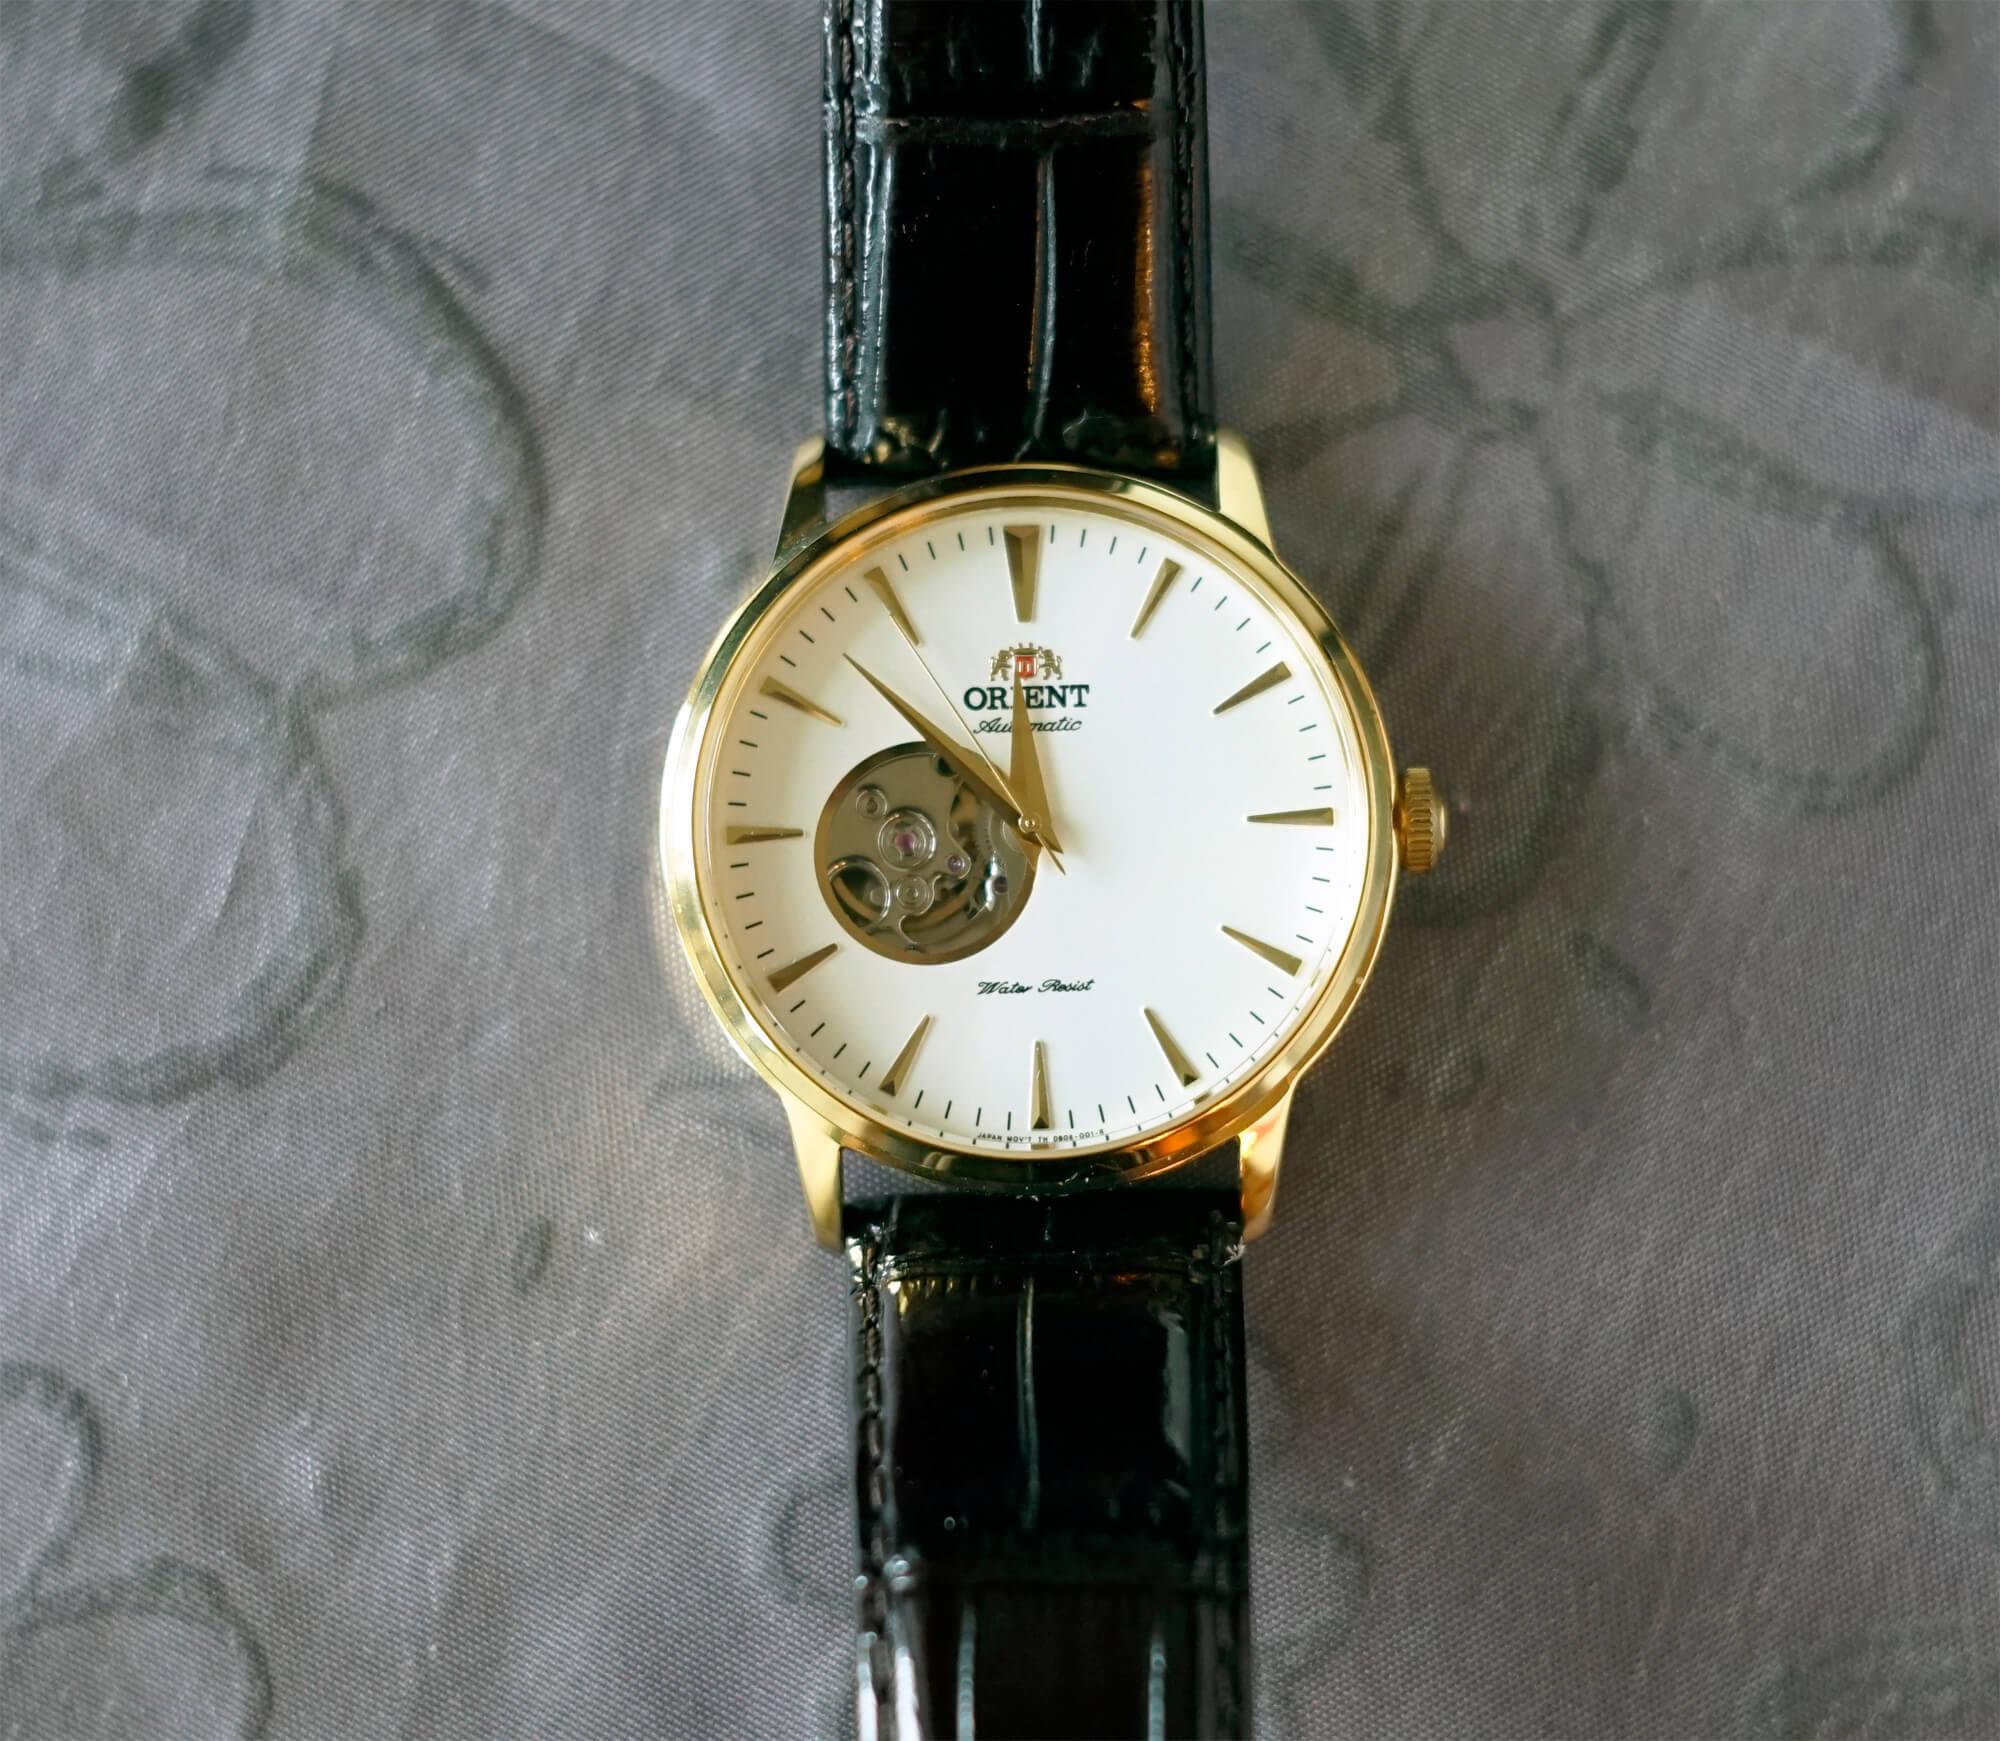 Orient Classic Automatic db08001w-1